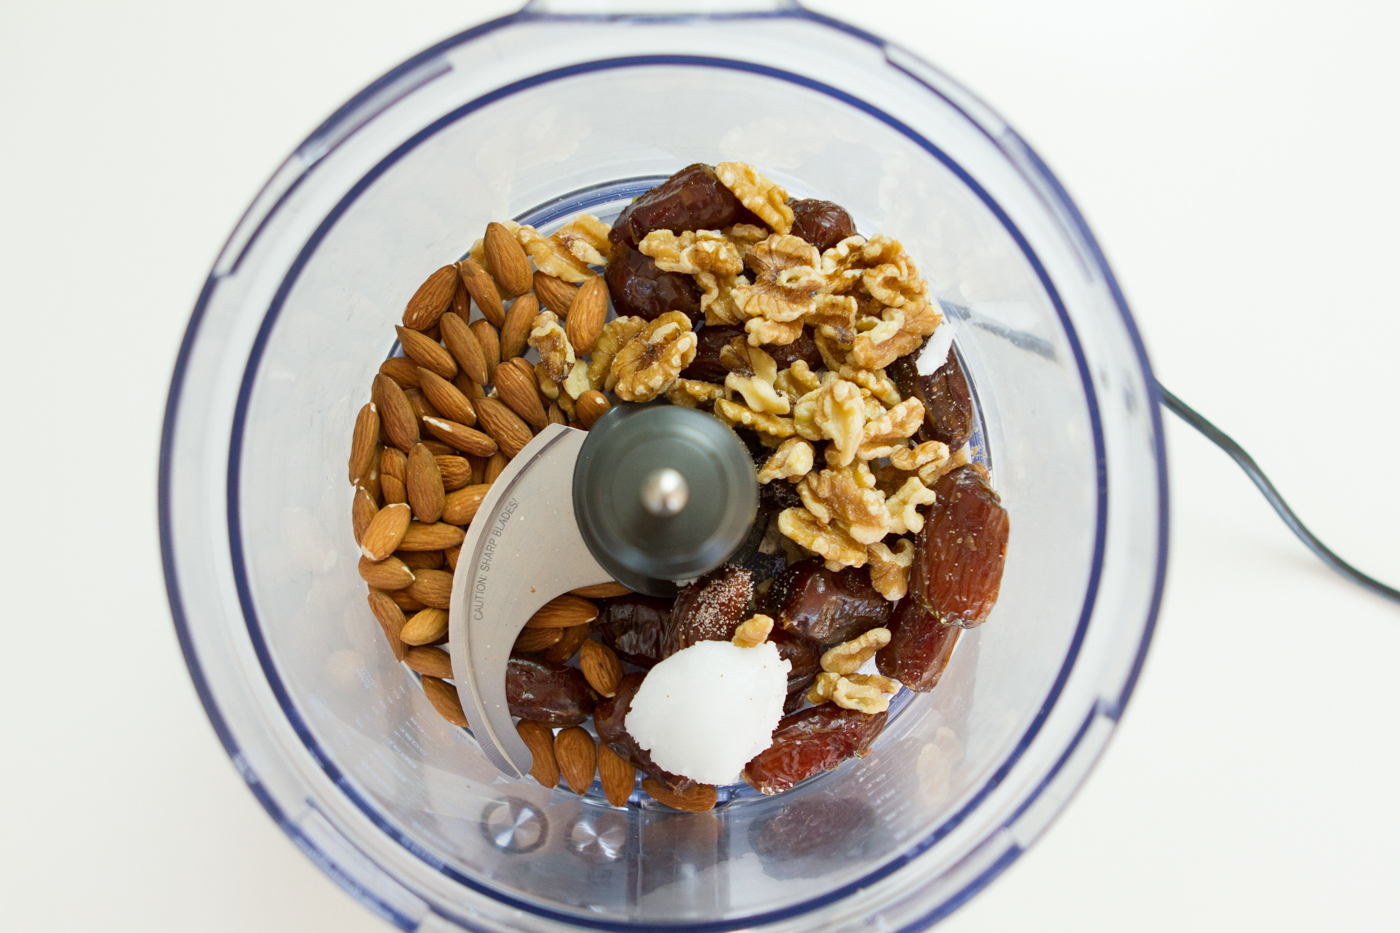 EarthHero - Vegan Pumpkin Cheesecake Bites Crust Ingredients